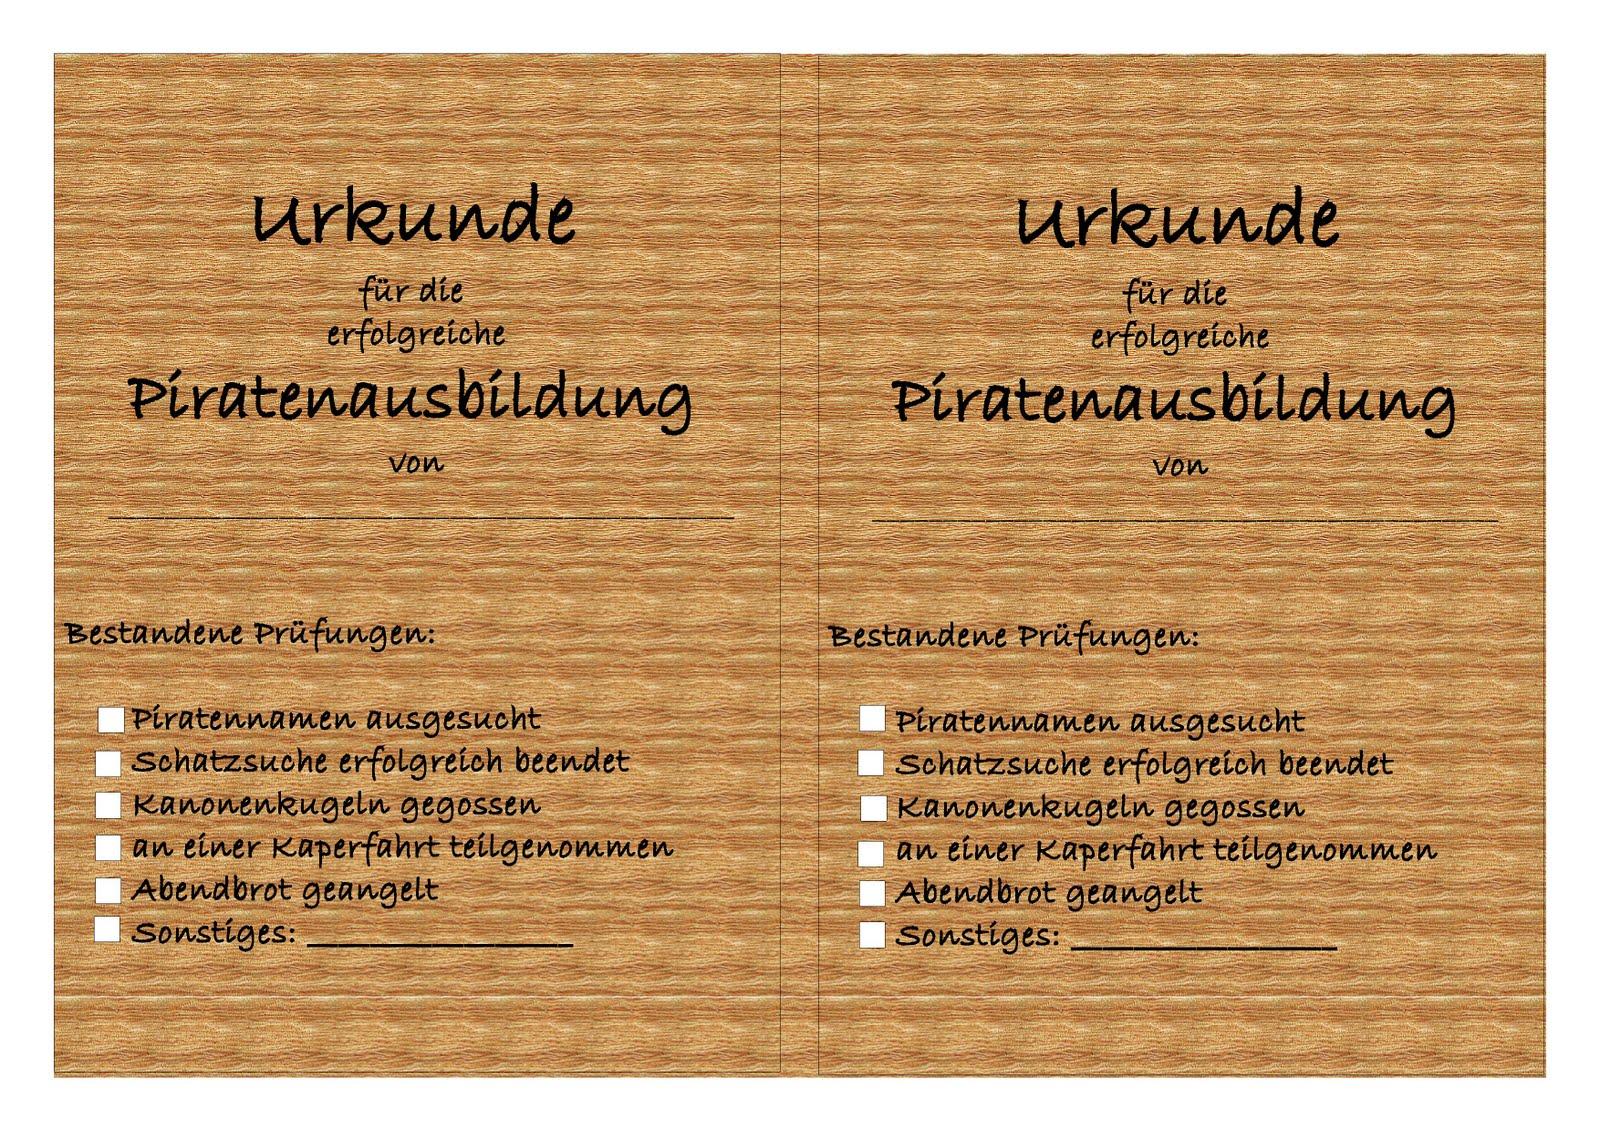 http://4.bp.blogspot.com/-7ymnszvNdEs/Tc_0QY_a_FI/AAAAAAAAAw0/1eqOhQ4YxVM/s1600/Urkunde+Piratenausbildung.jpg